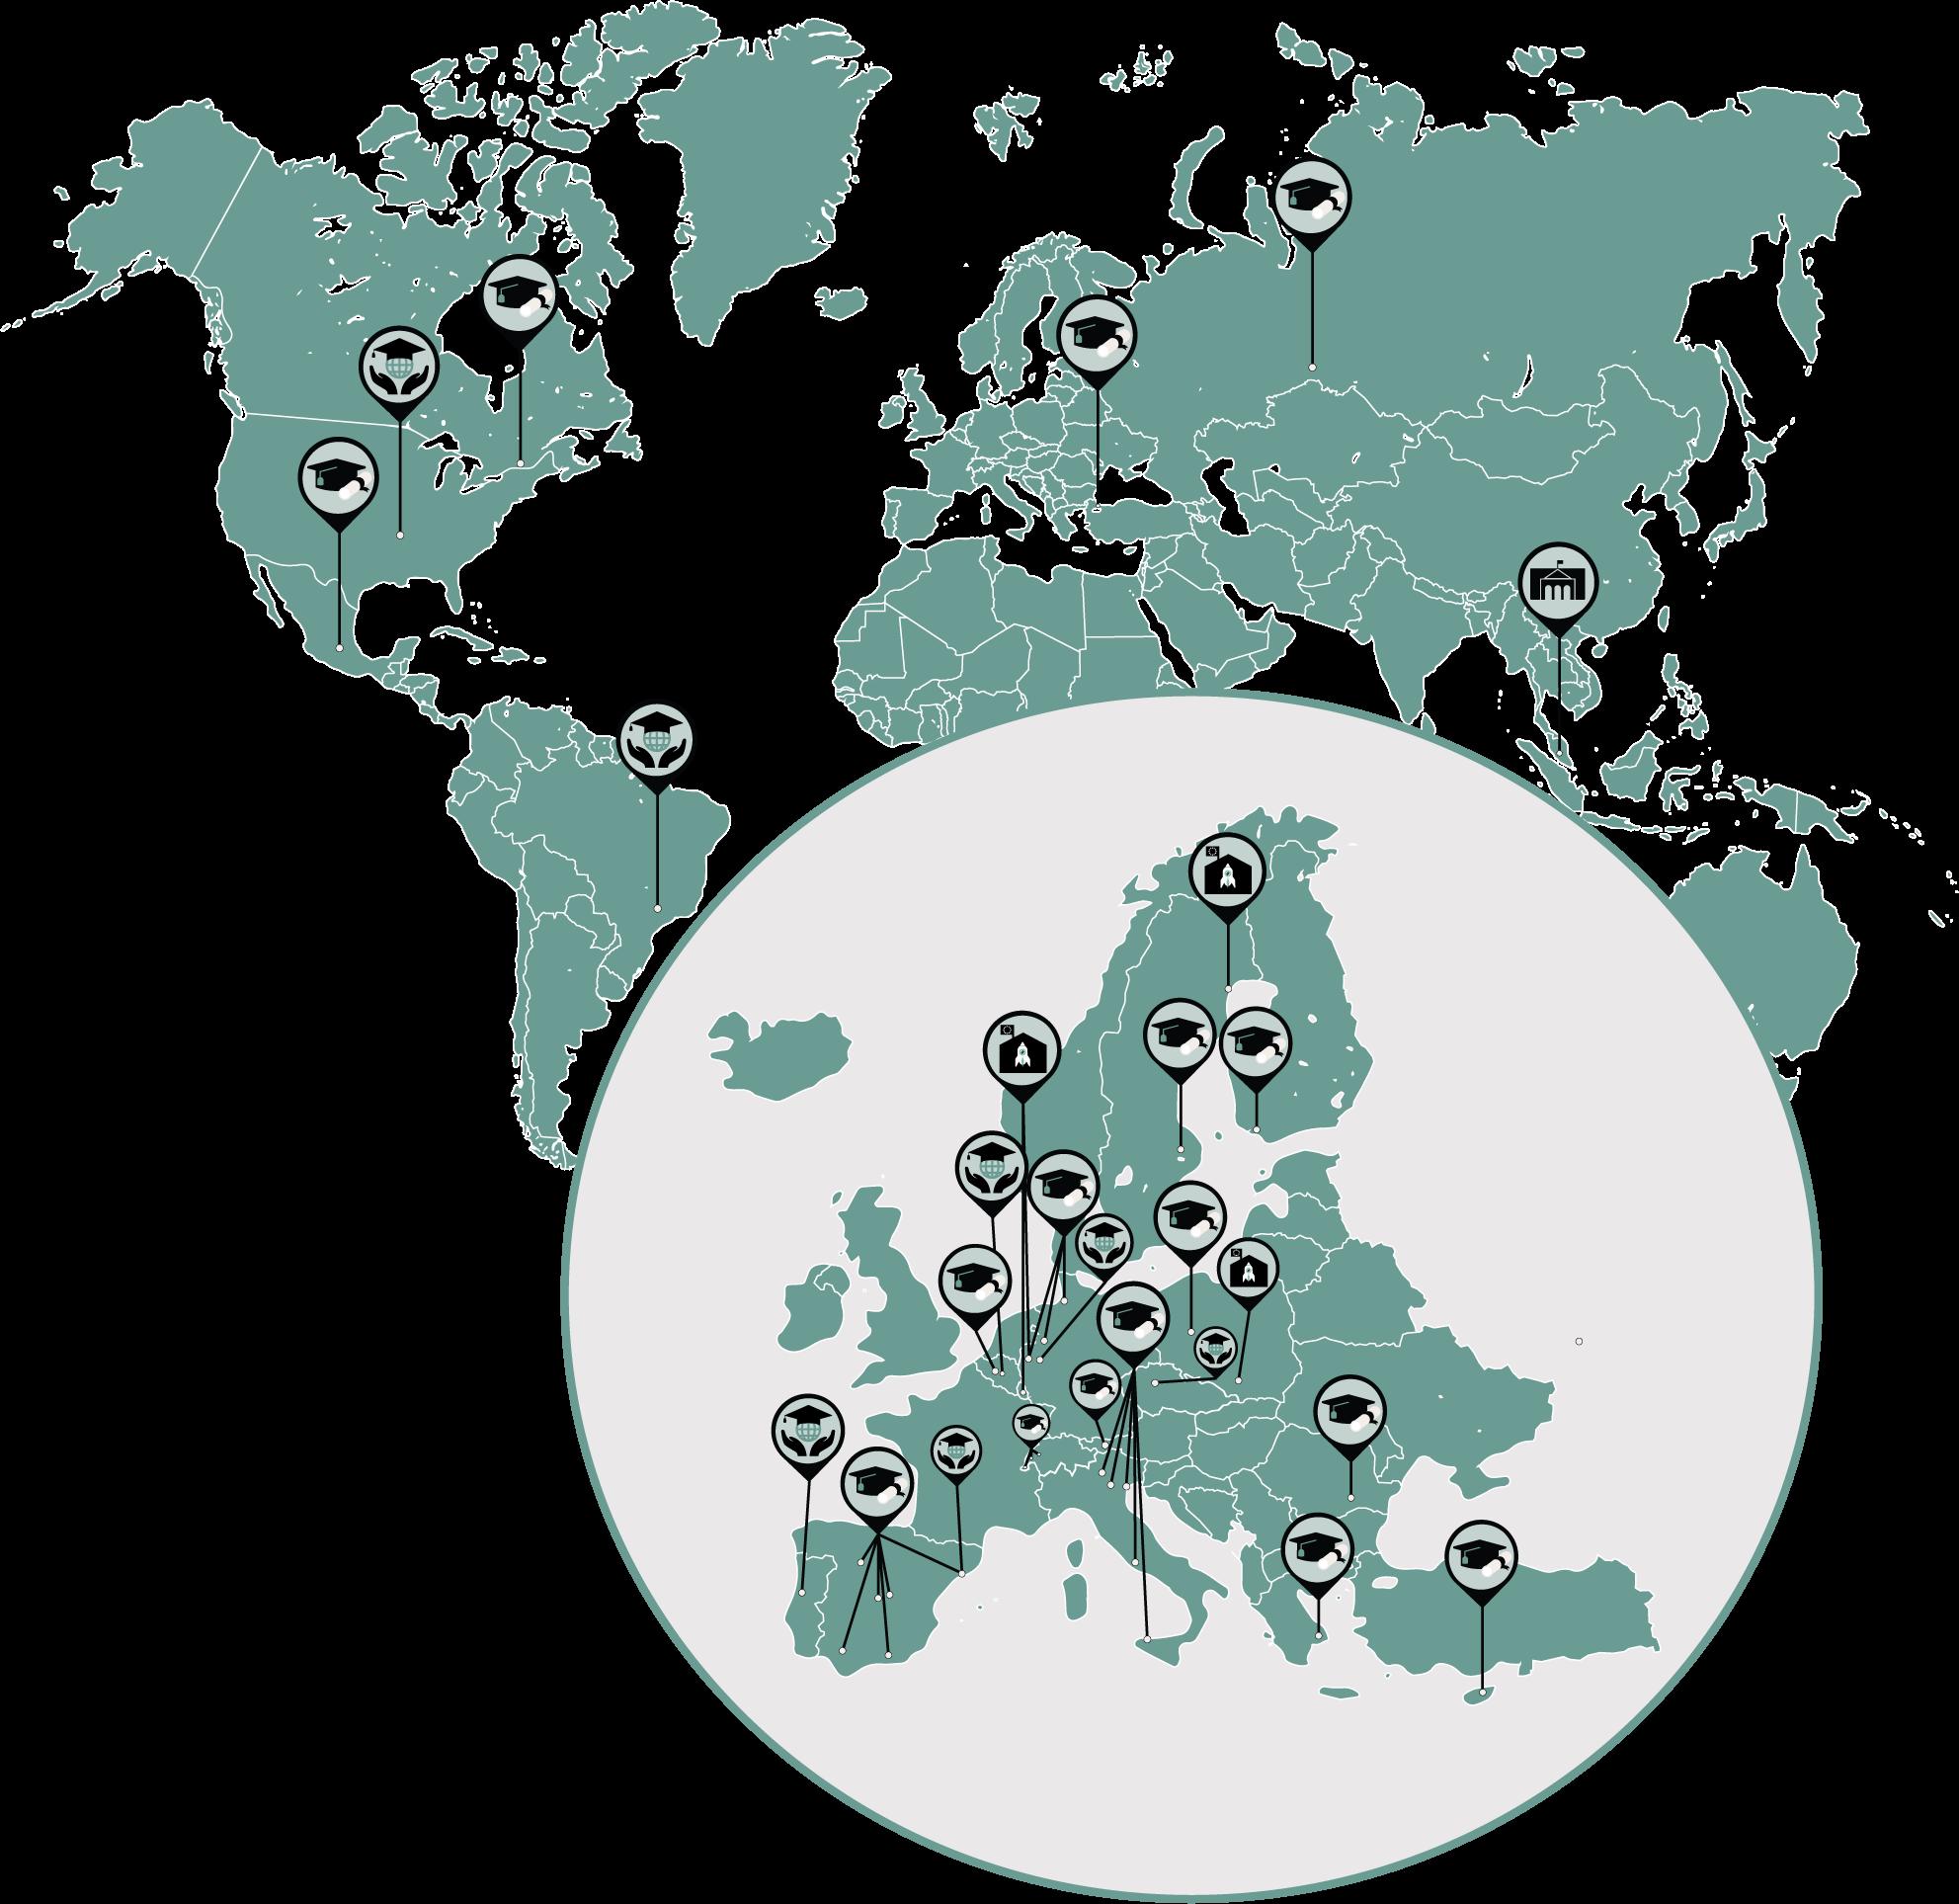 Carte monde politique internationale